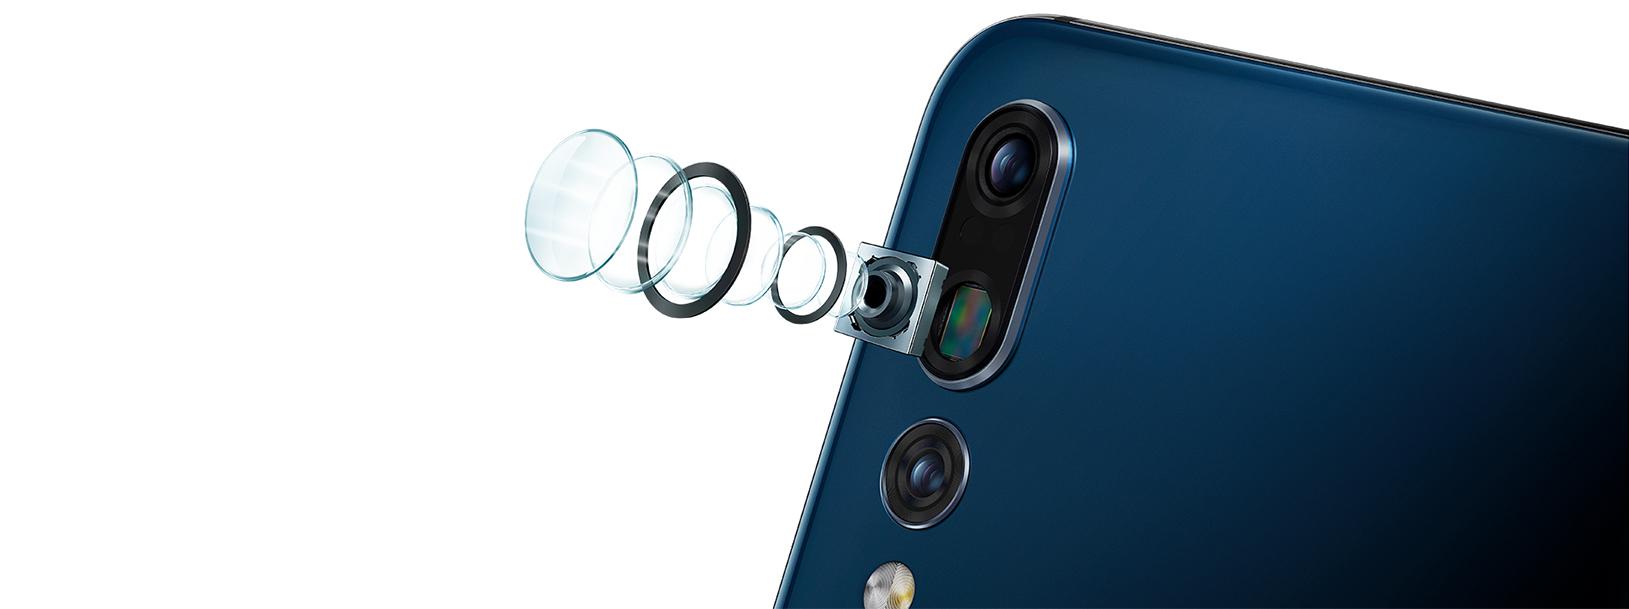 Потрійна камера Leica на Huawei P20 Pro